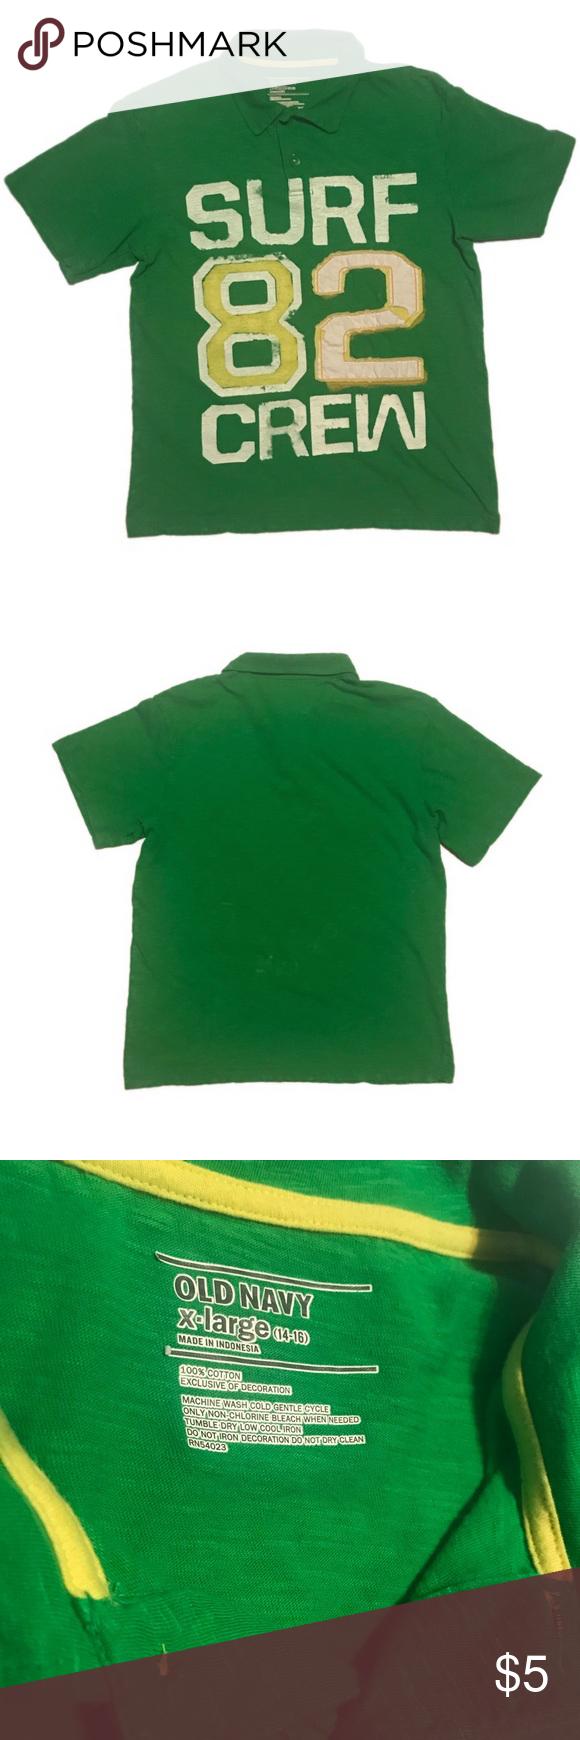 Old Navy Green Collared Shirt In 2018 My Posh Picks Shirts